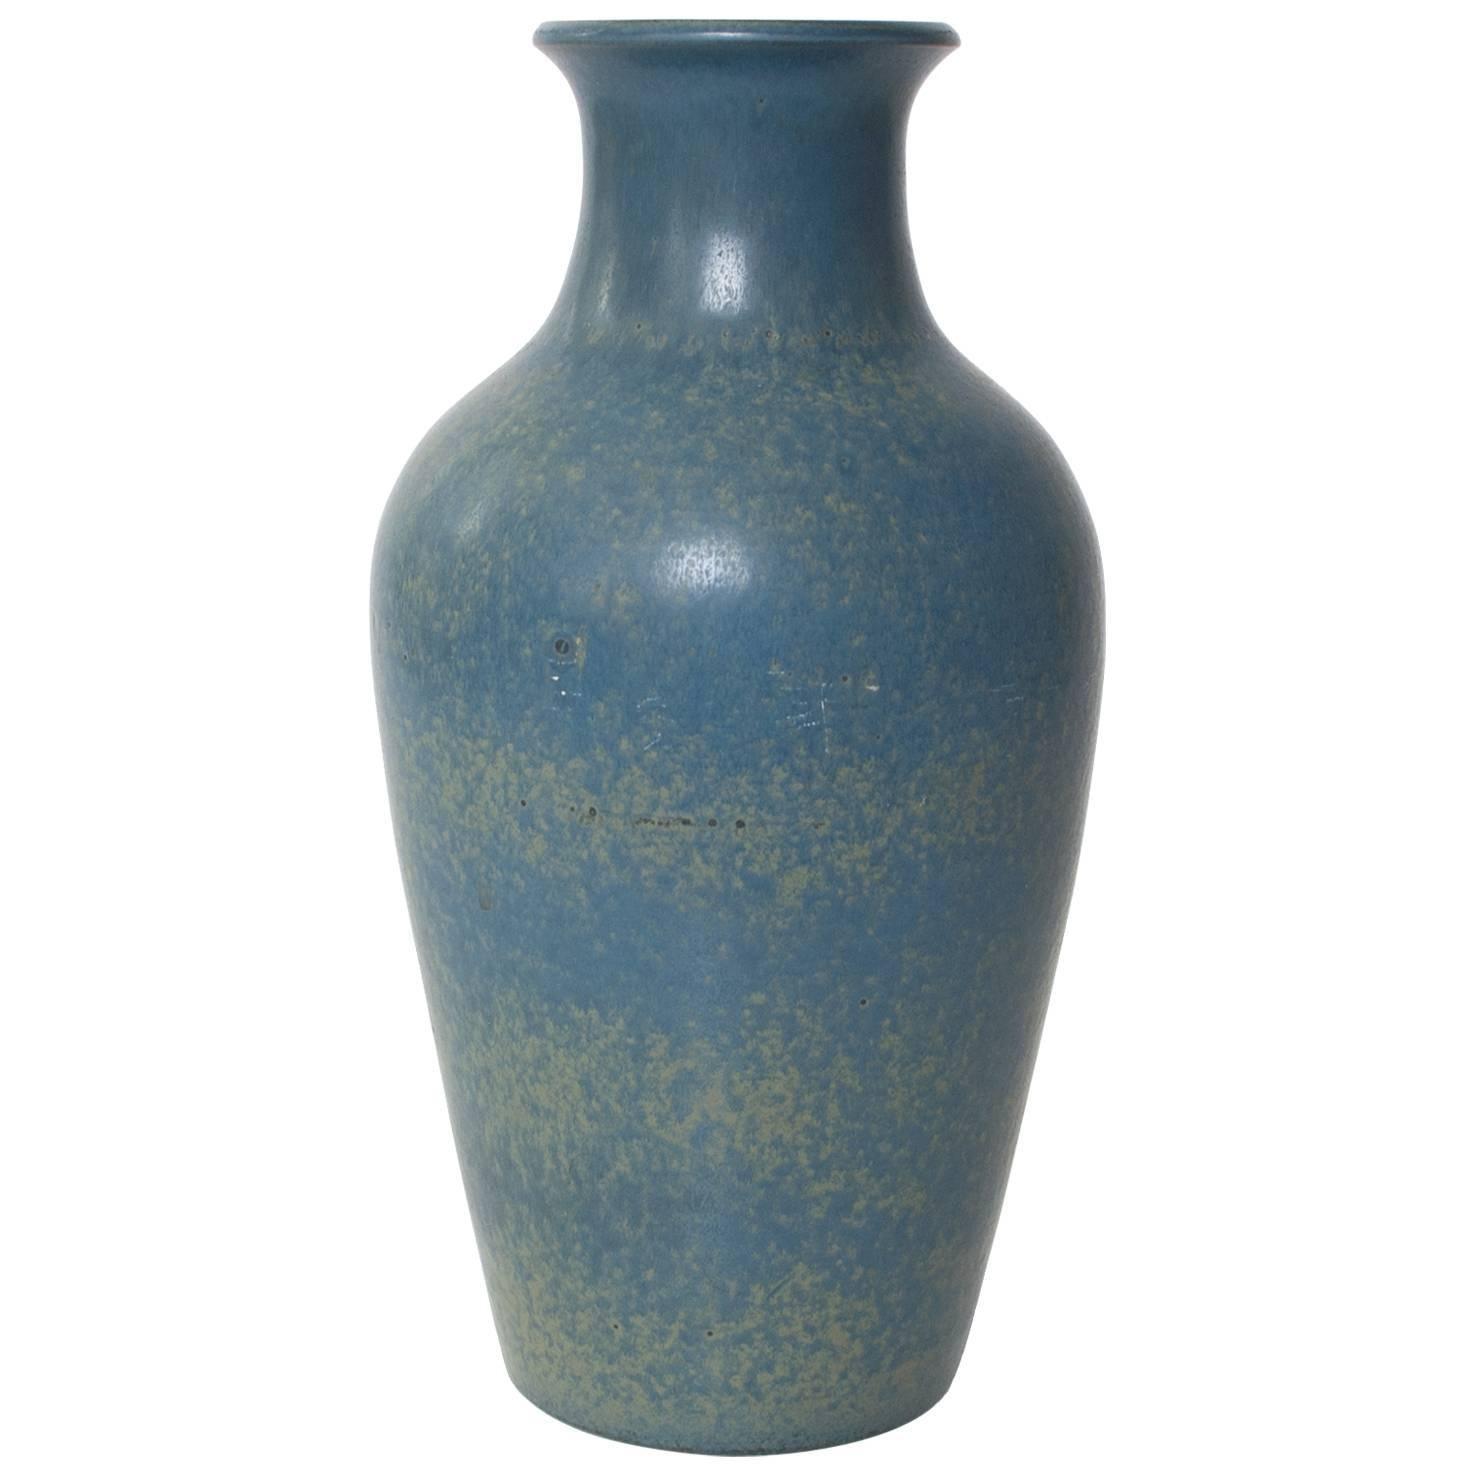 Scandinavian Modern Blue Vase with Glaze by Gunnar Nylund, Rörstrand